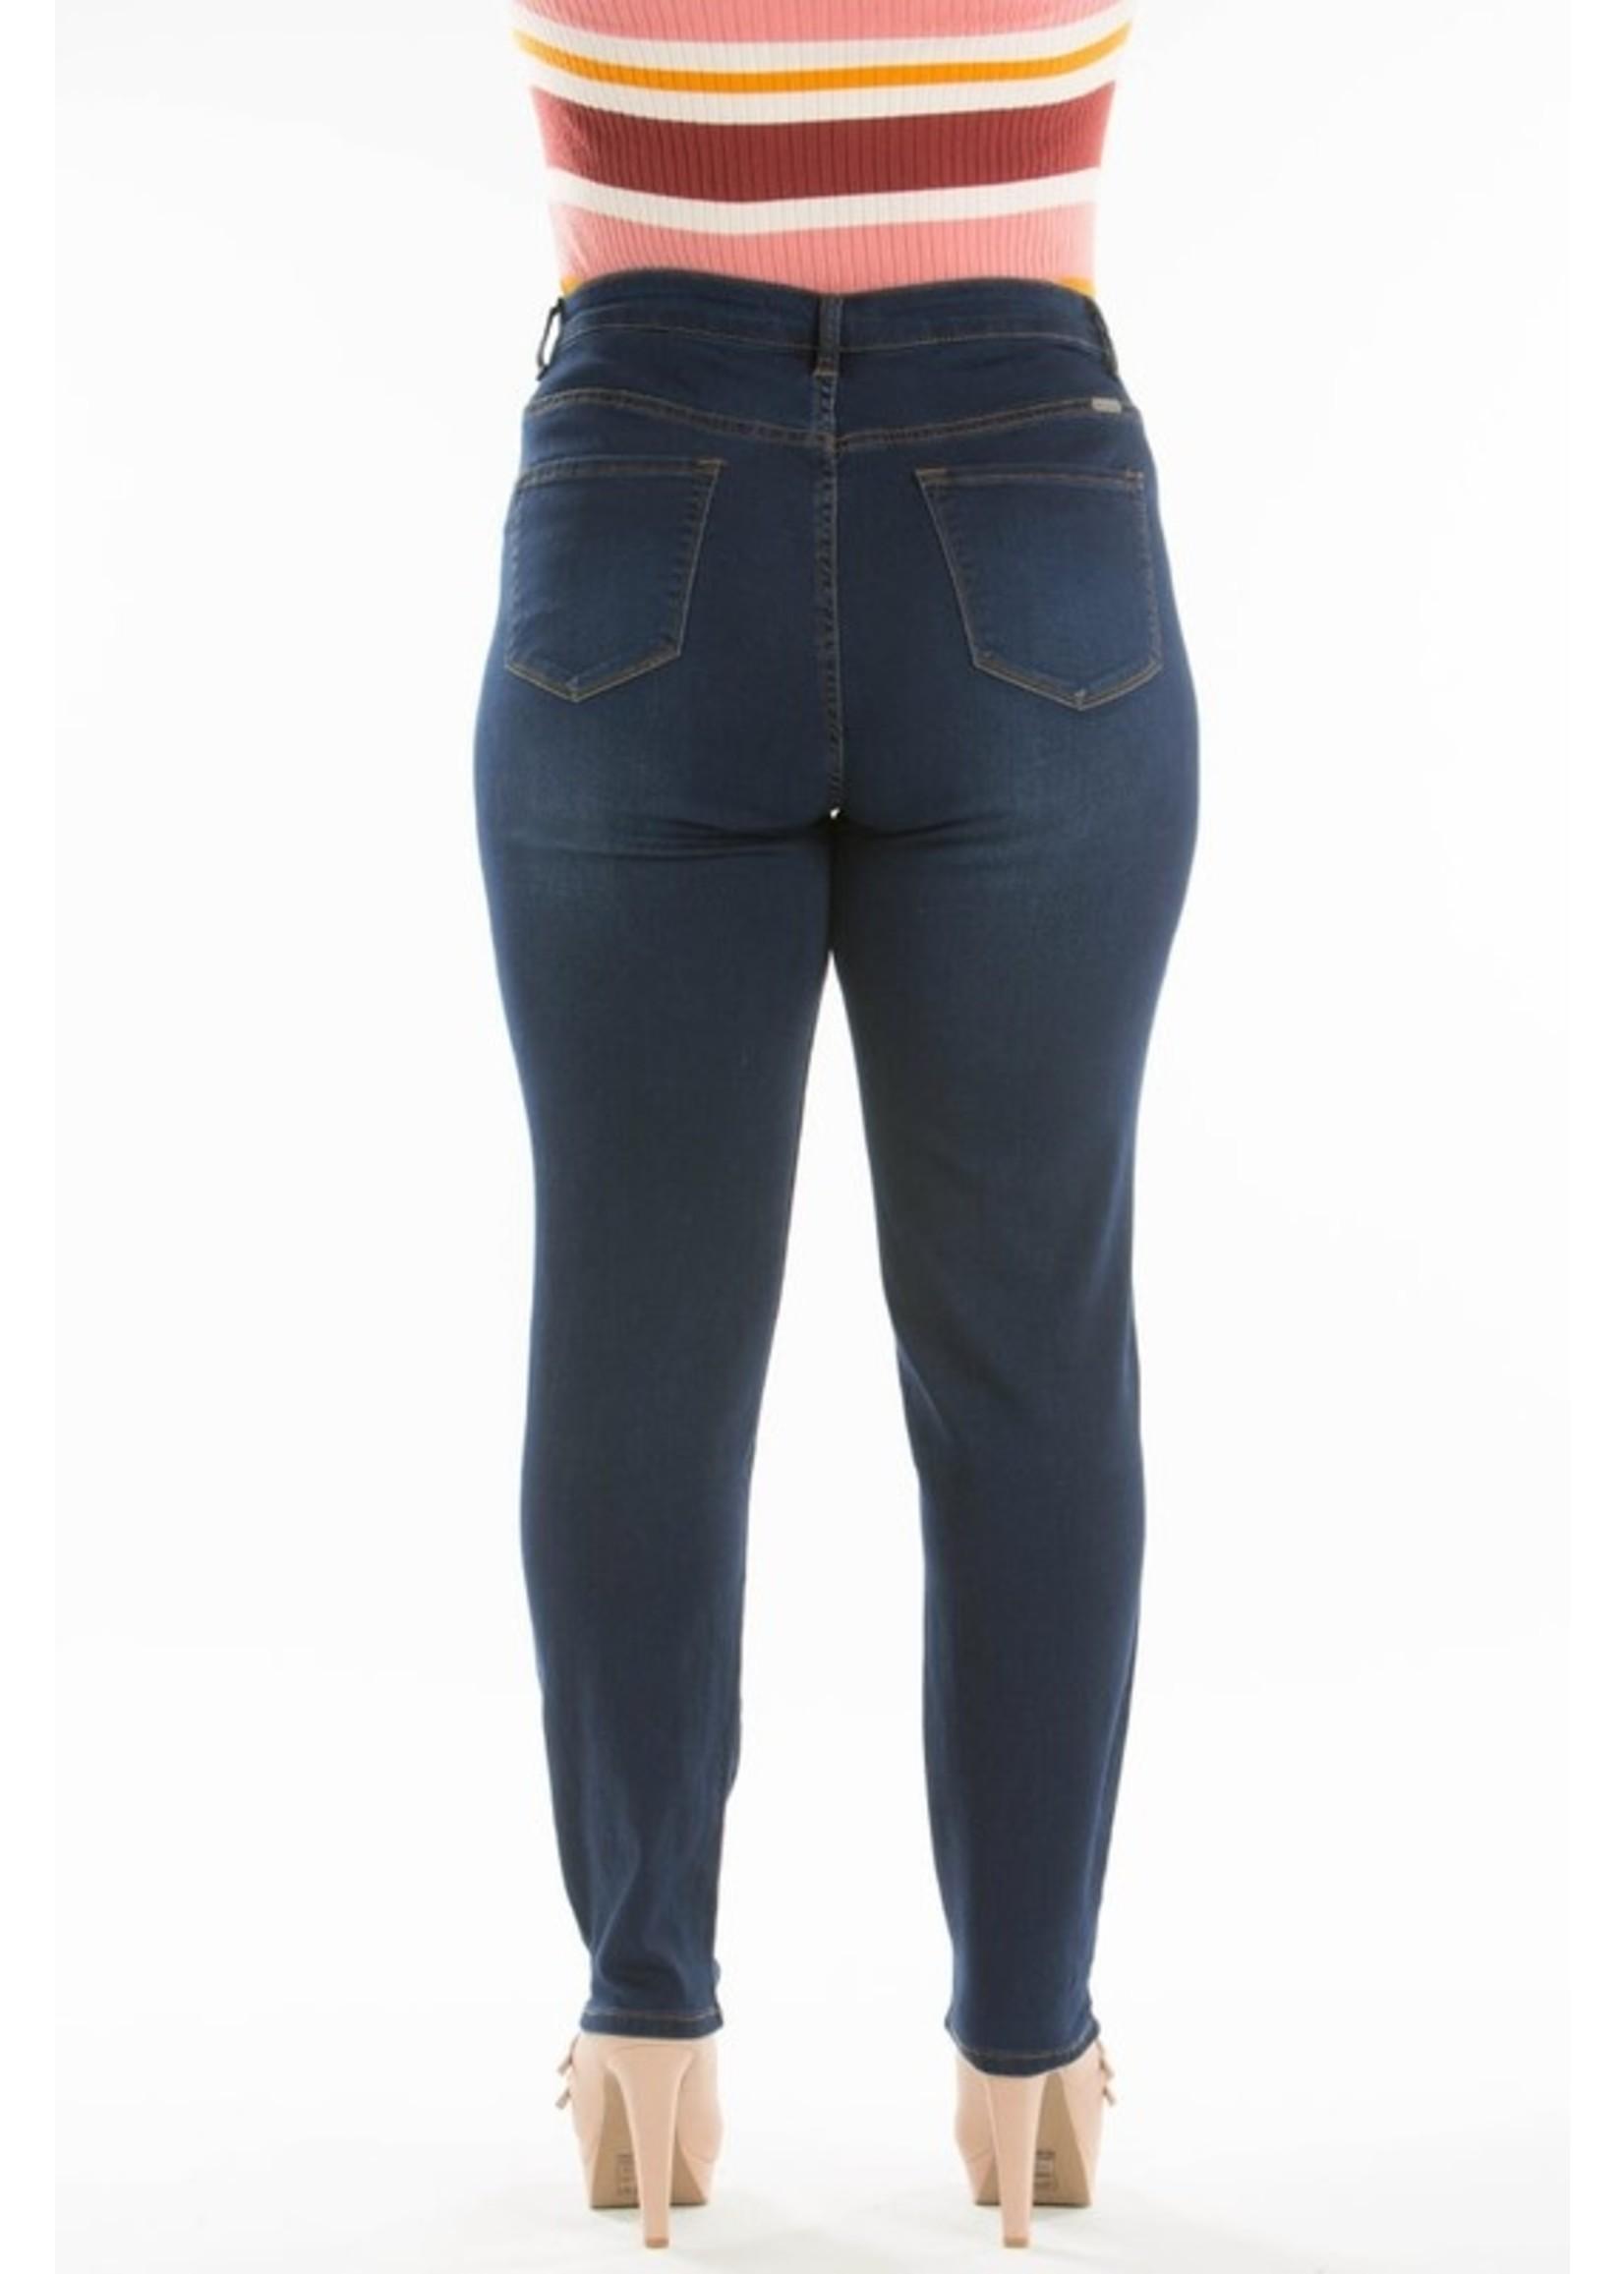 KanCan Gemma High Rise Super Skinny Jeans